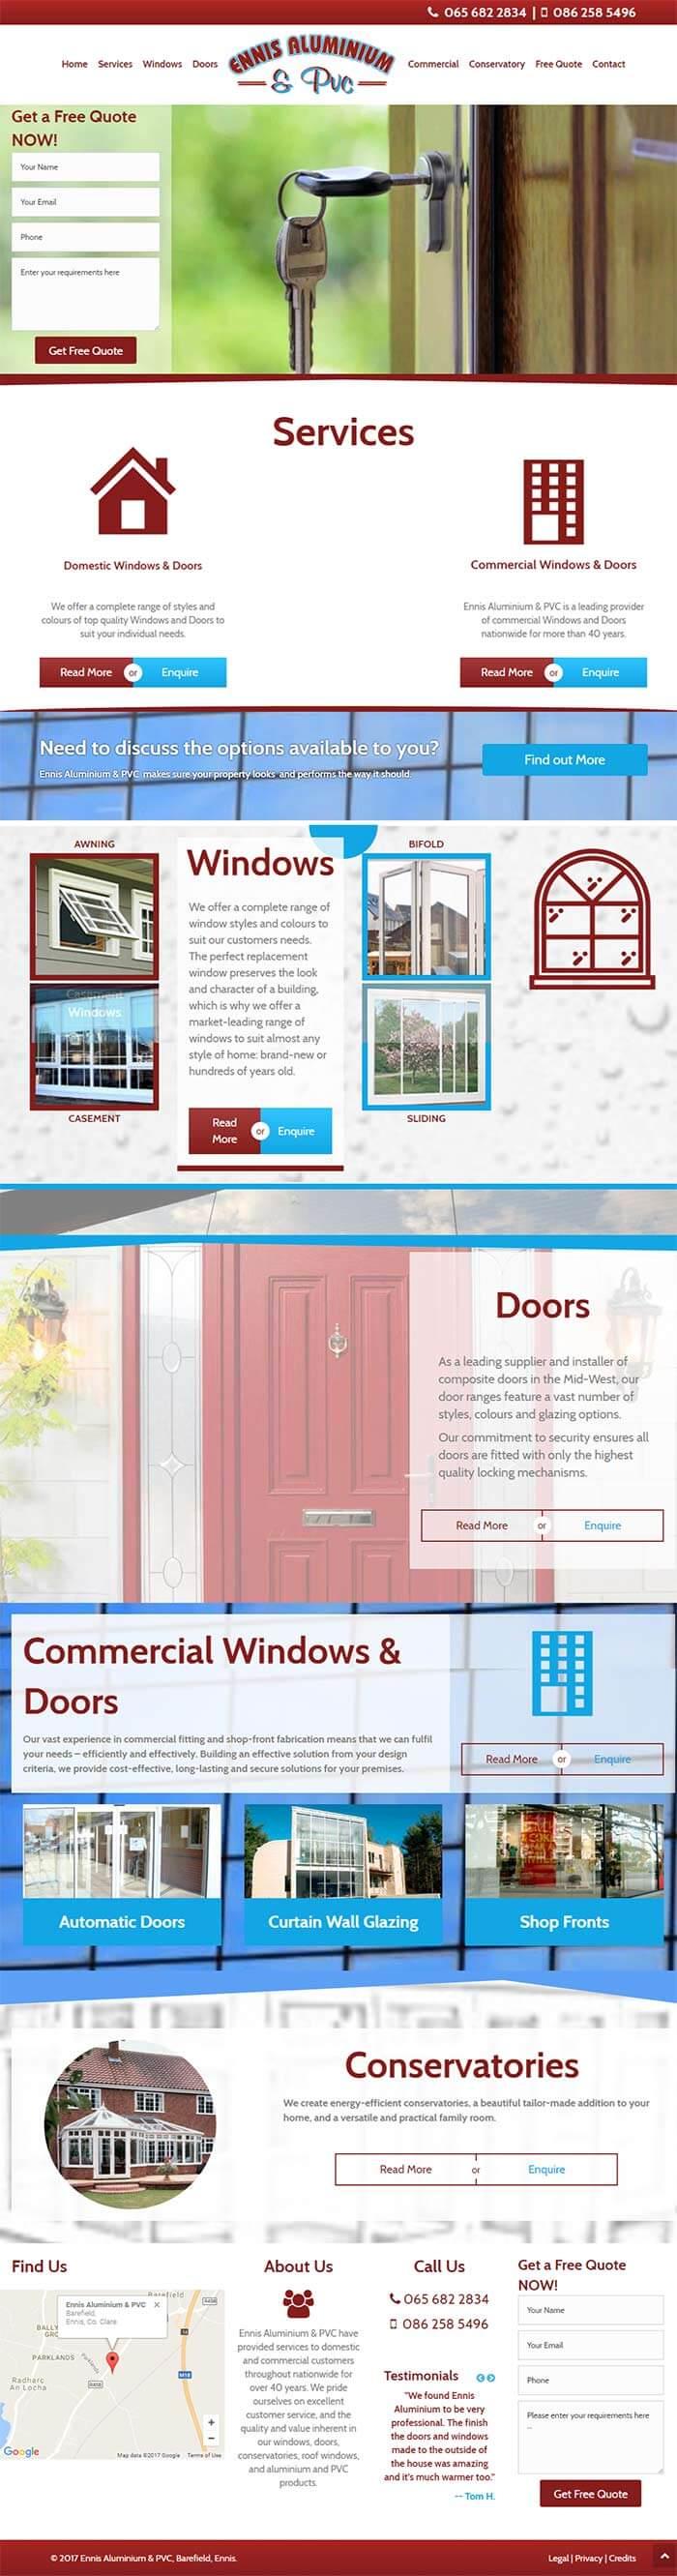 Ennis aluminium website full length